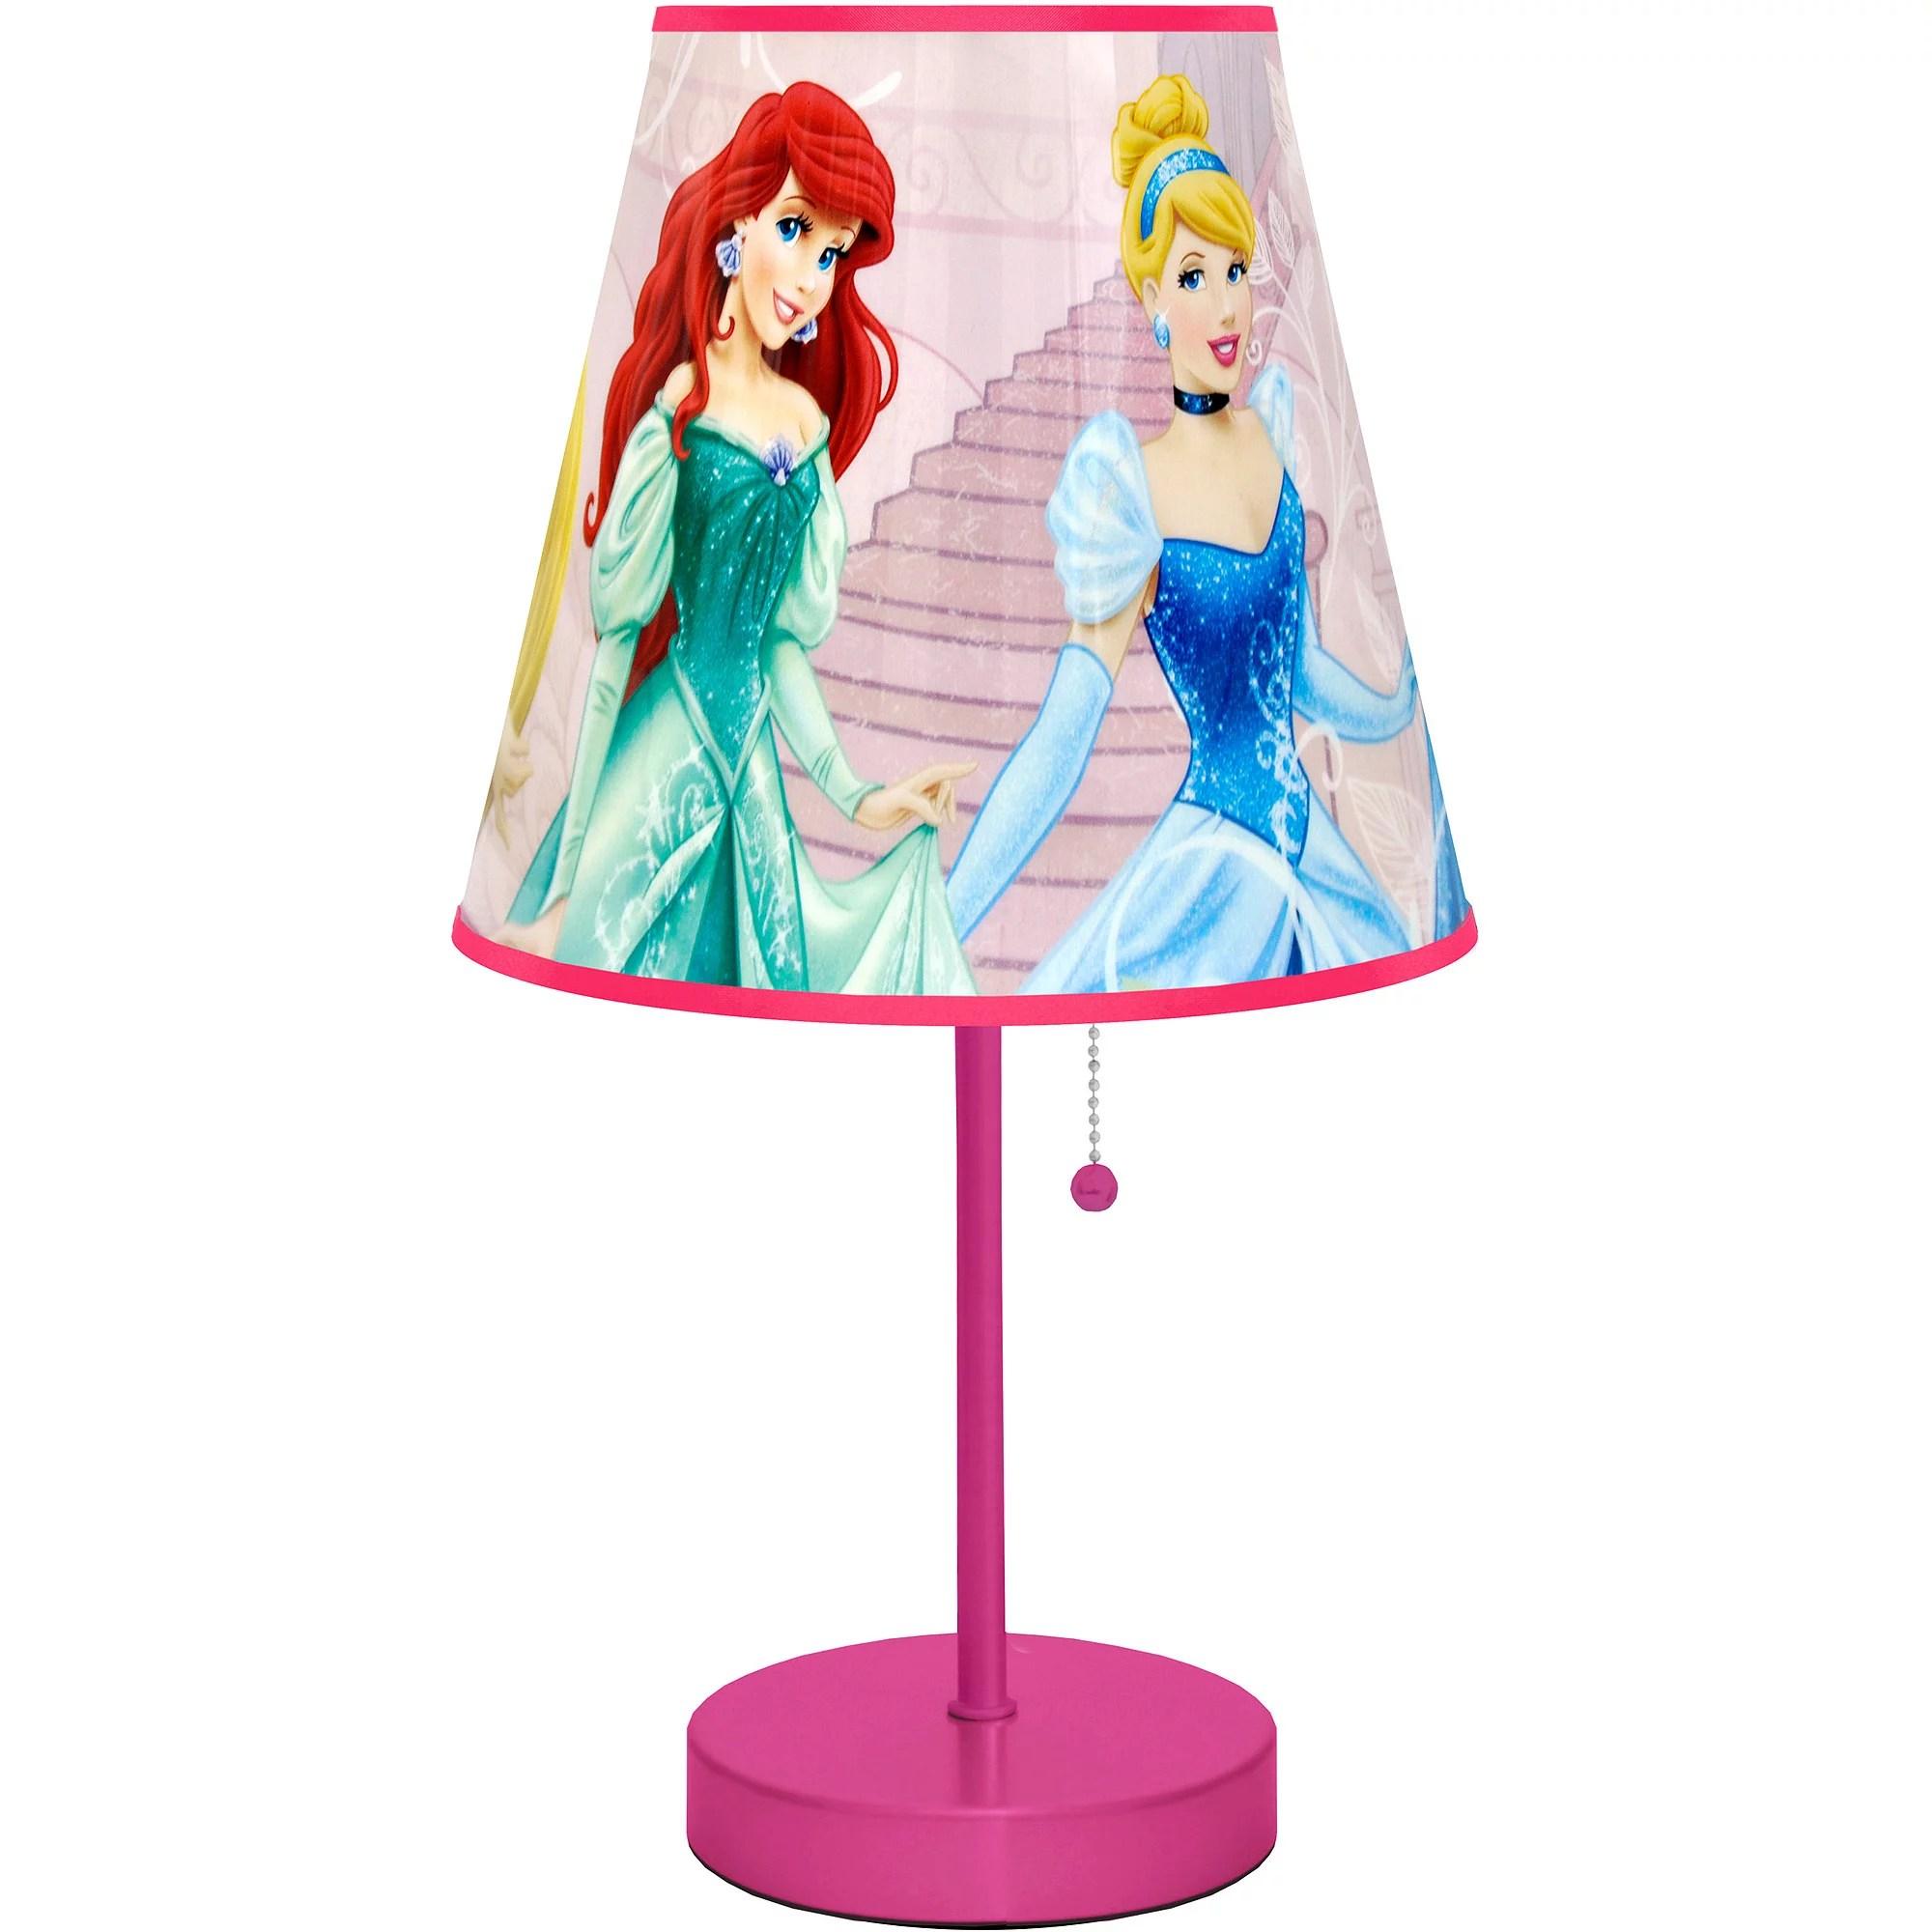 Disney Princess Table Lamp, Pink